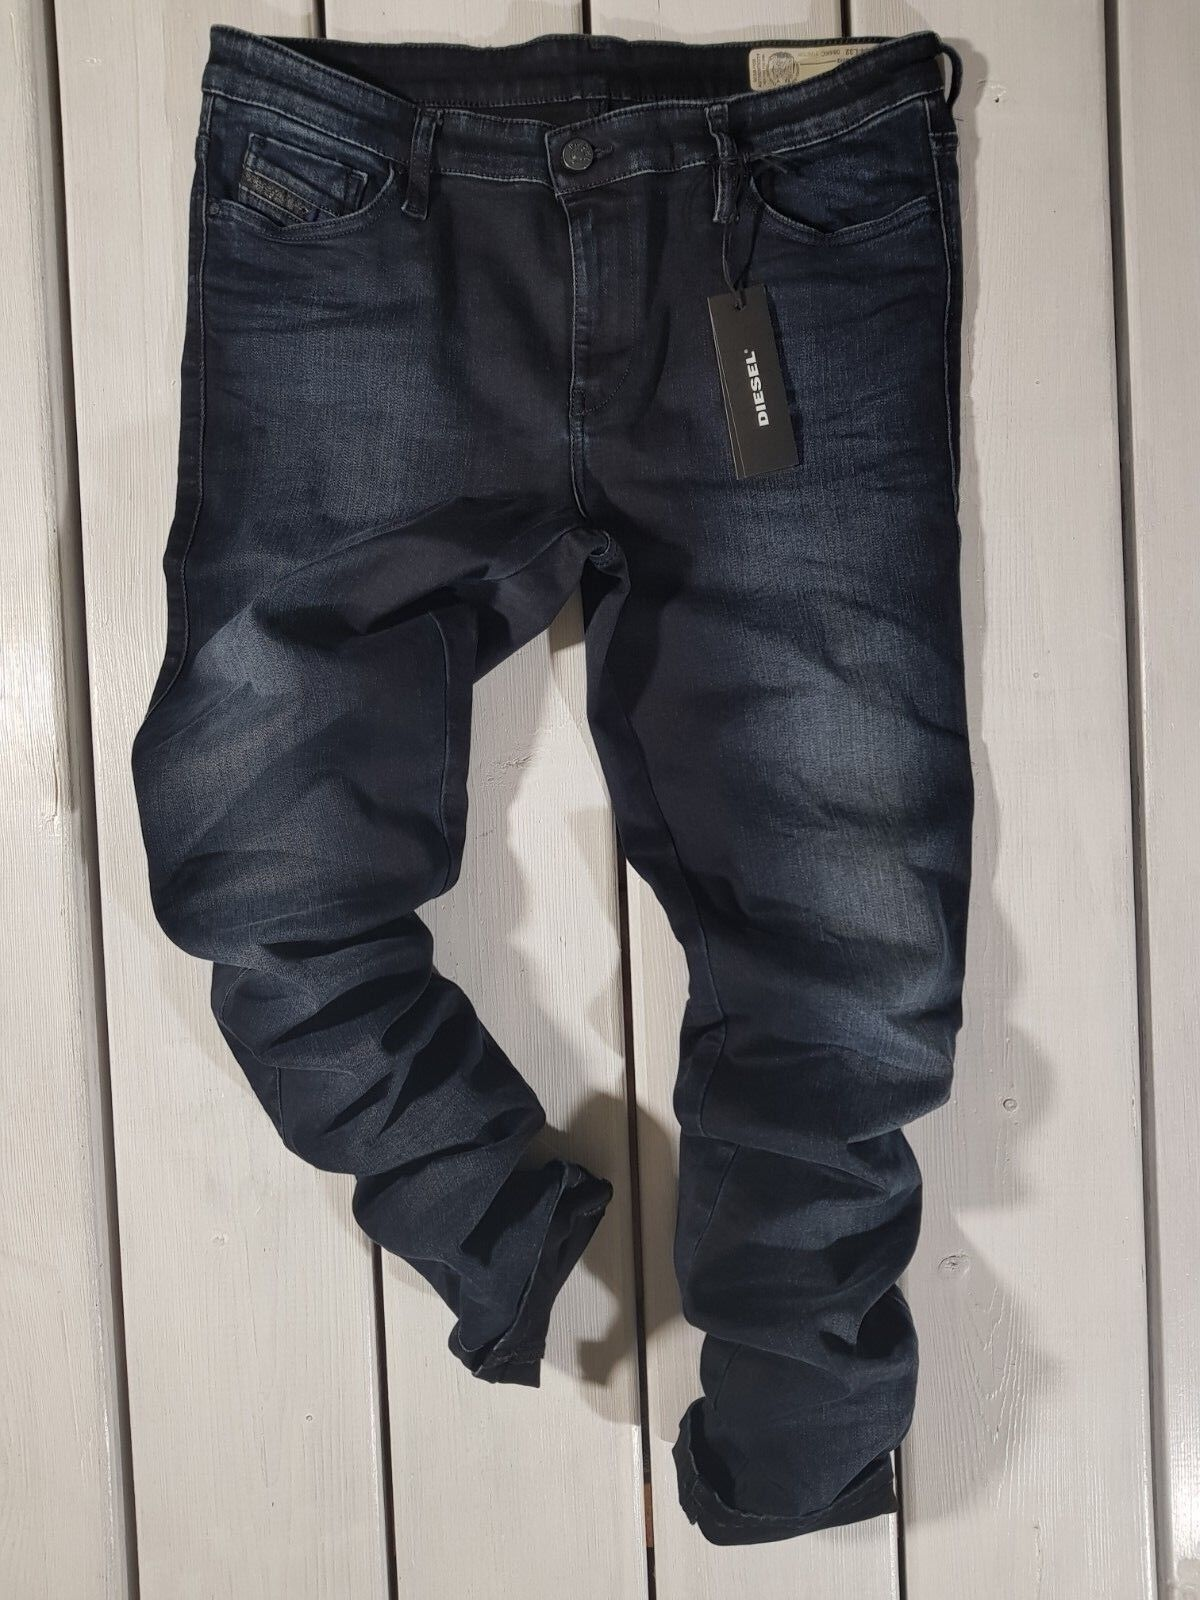 Neu Diesel DAMEN Jeans W34 L32 Skinzee 084KC Supereng Skinny Reg